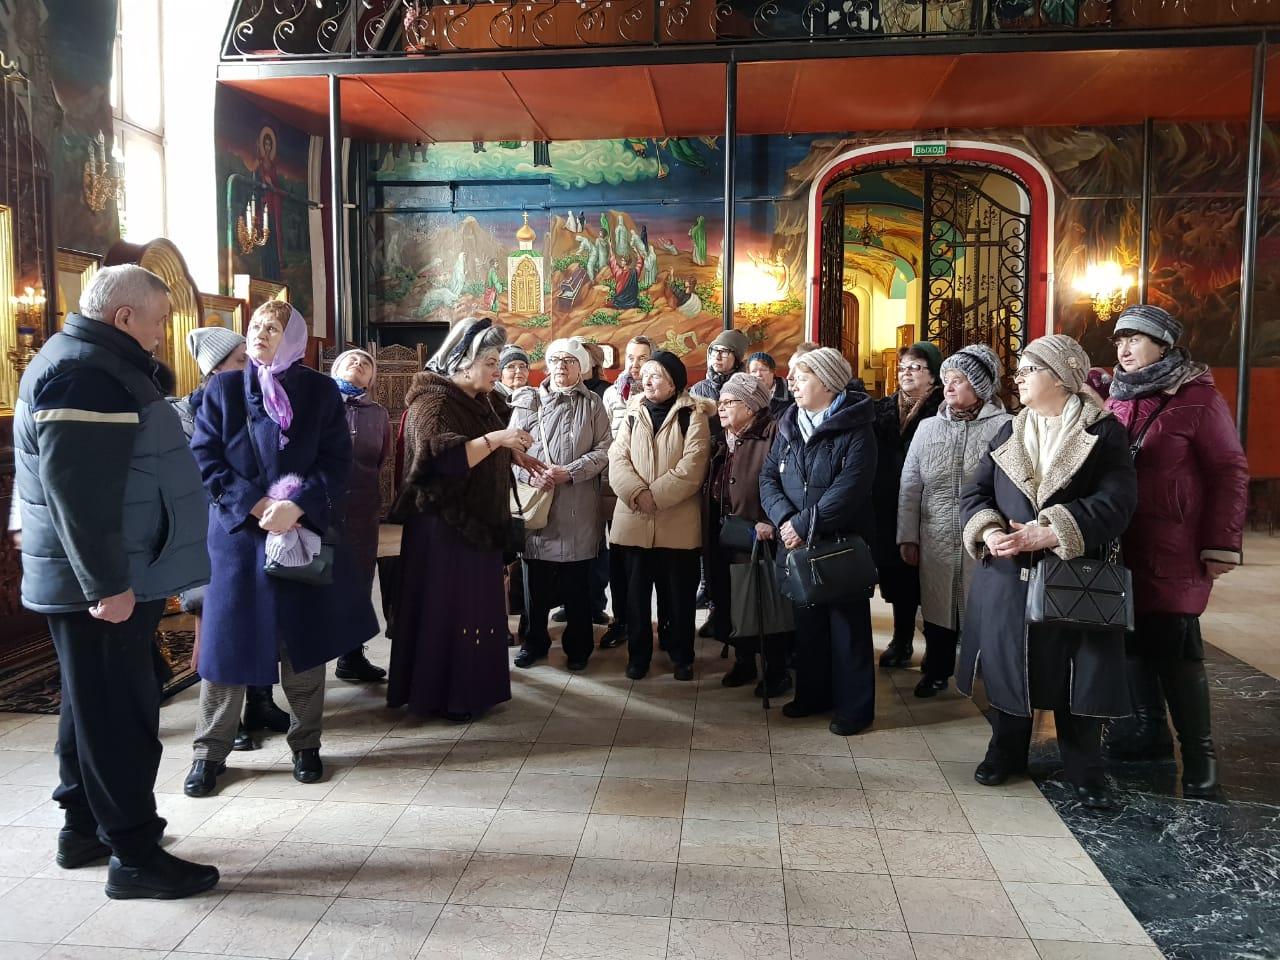 Паломники в нашем Храме. 23.03.19 post thumbnail image